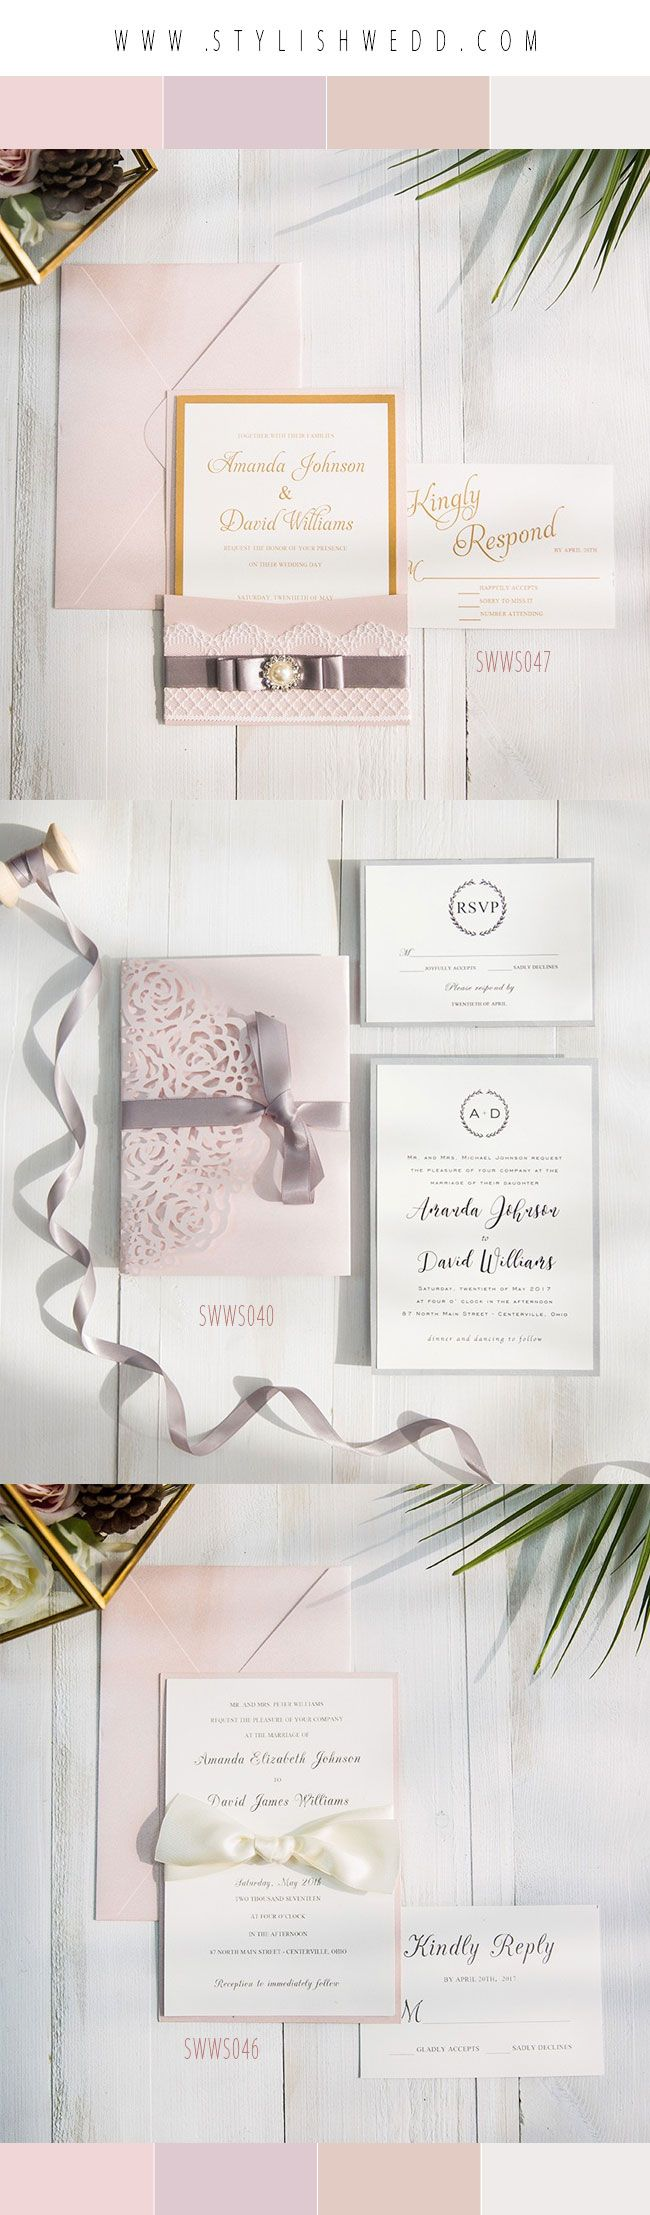 StylishWedd Romantic Mauve Blush Ribbon Wedding Invitations